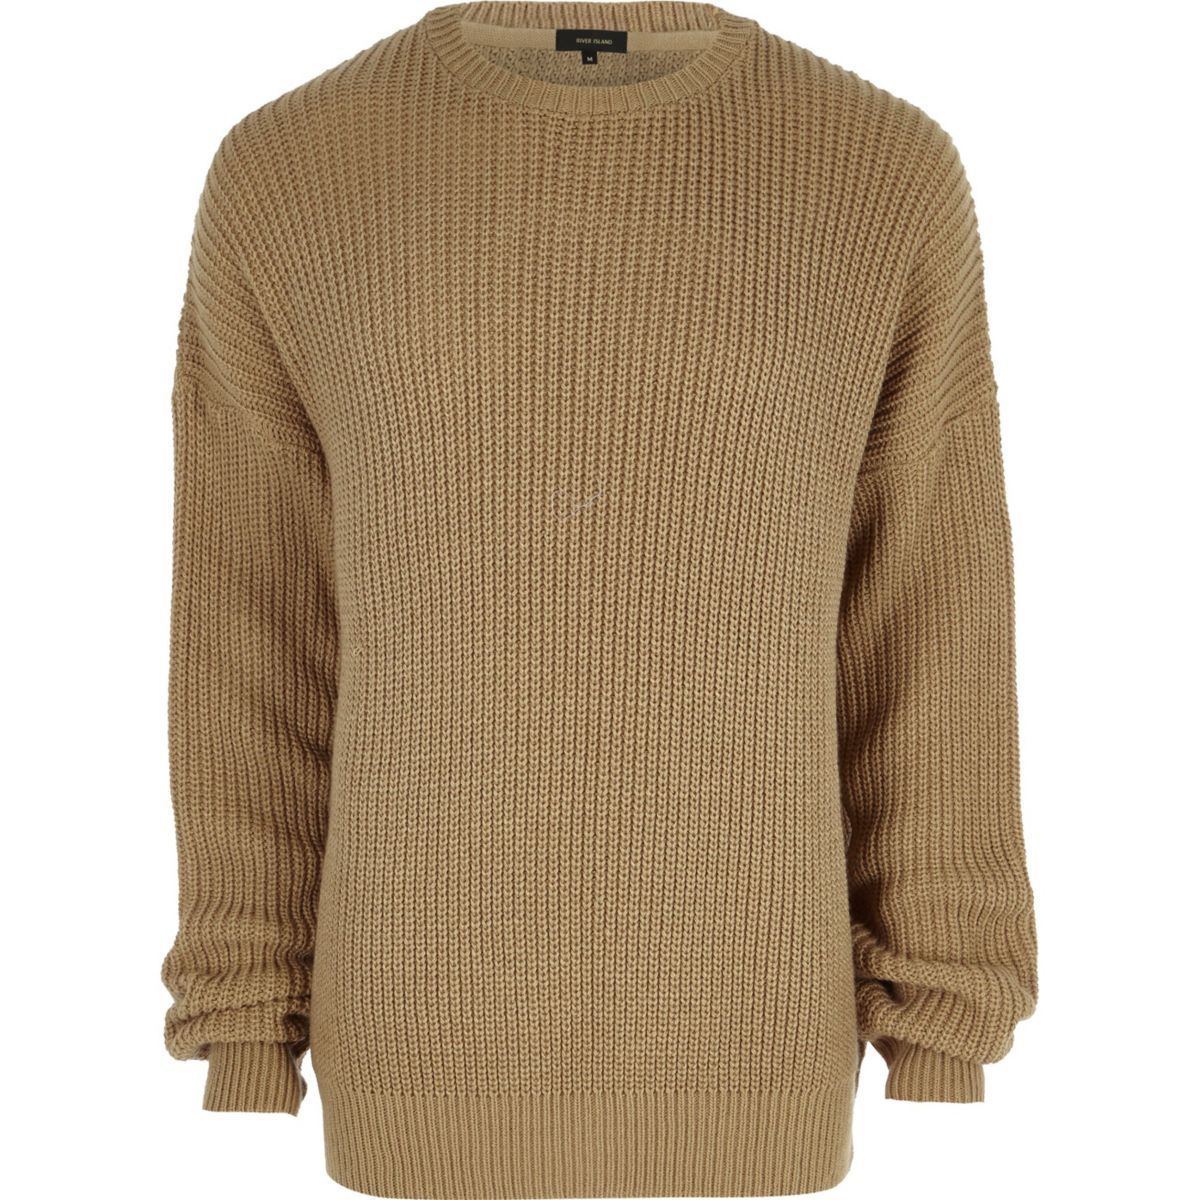 Camel oversized fisherman sweater